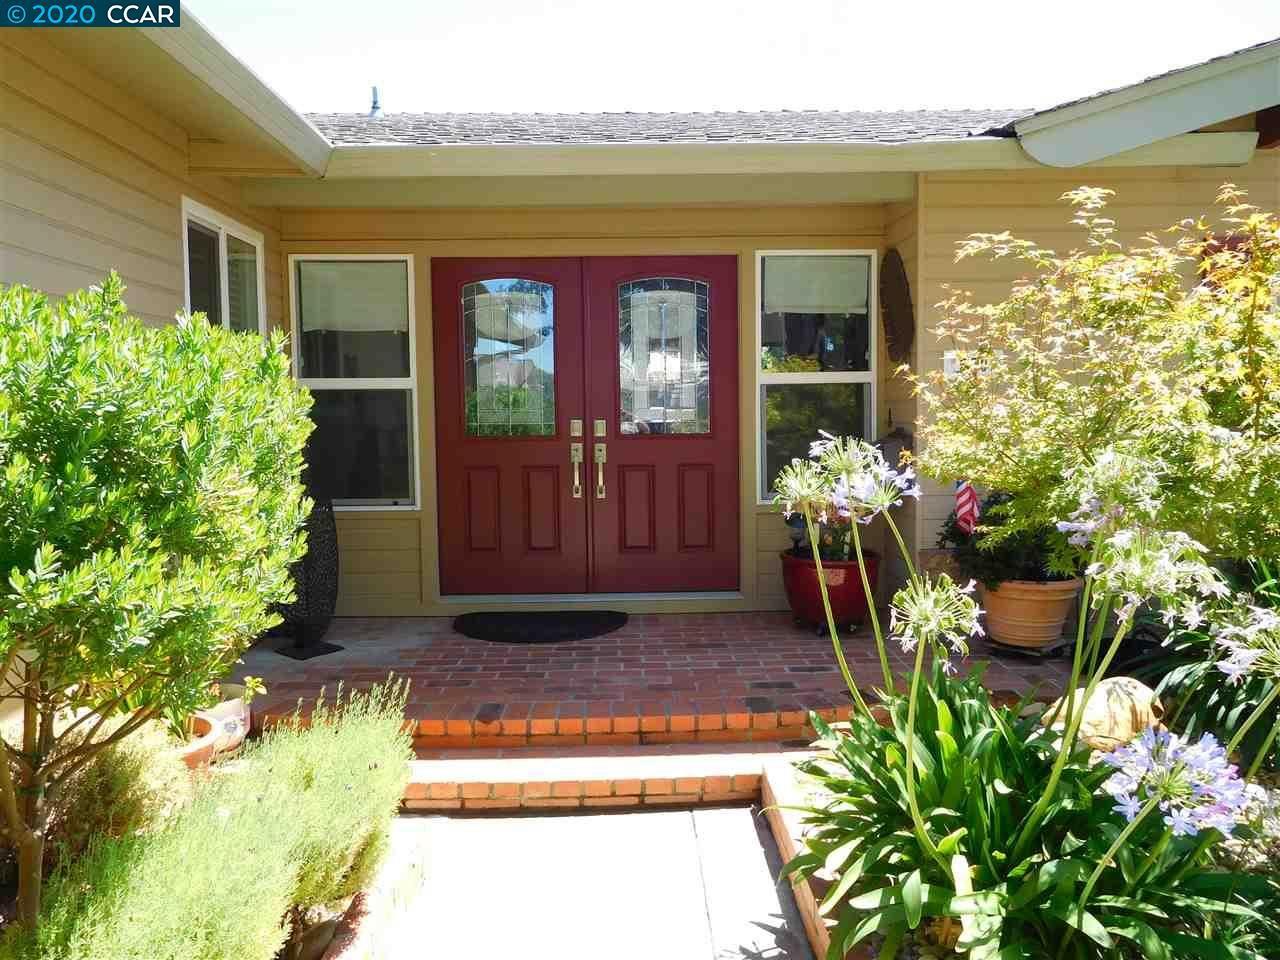 Photo of 530 Zircon Way, LIVERMORE, CA 94550-5150 (MLS # 40915945)